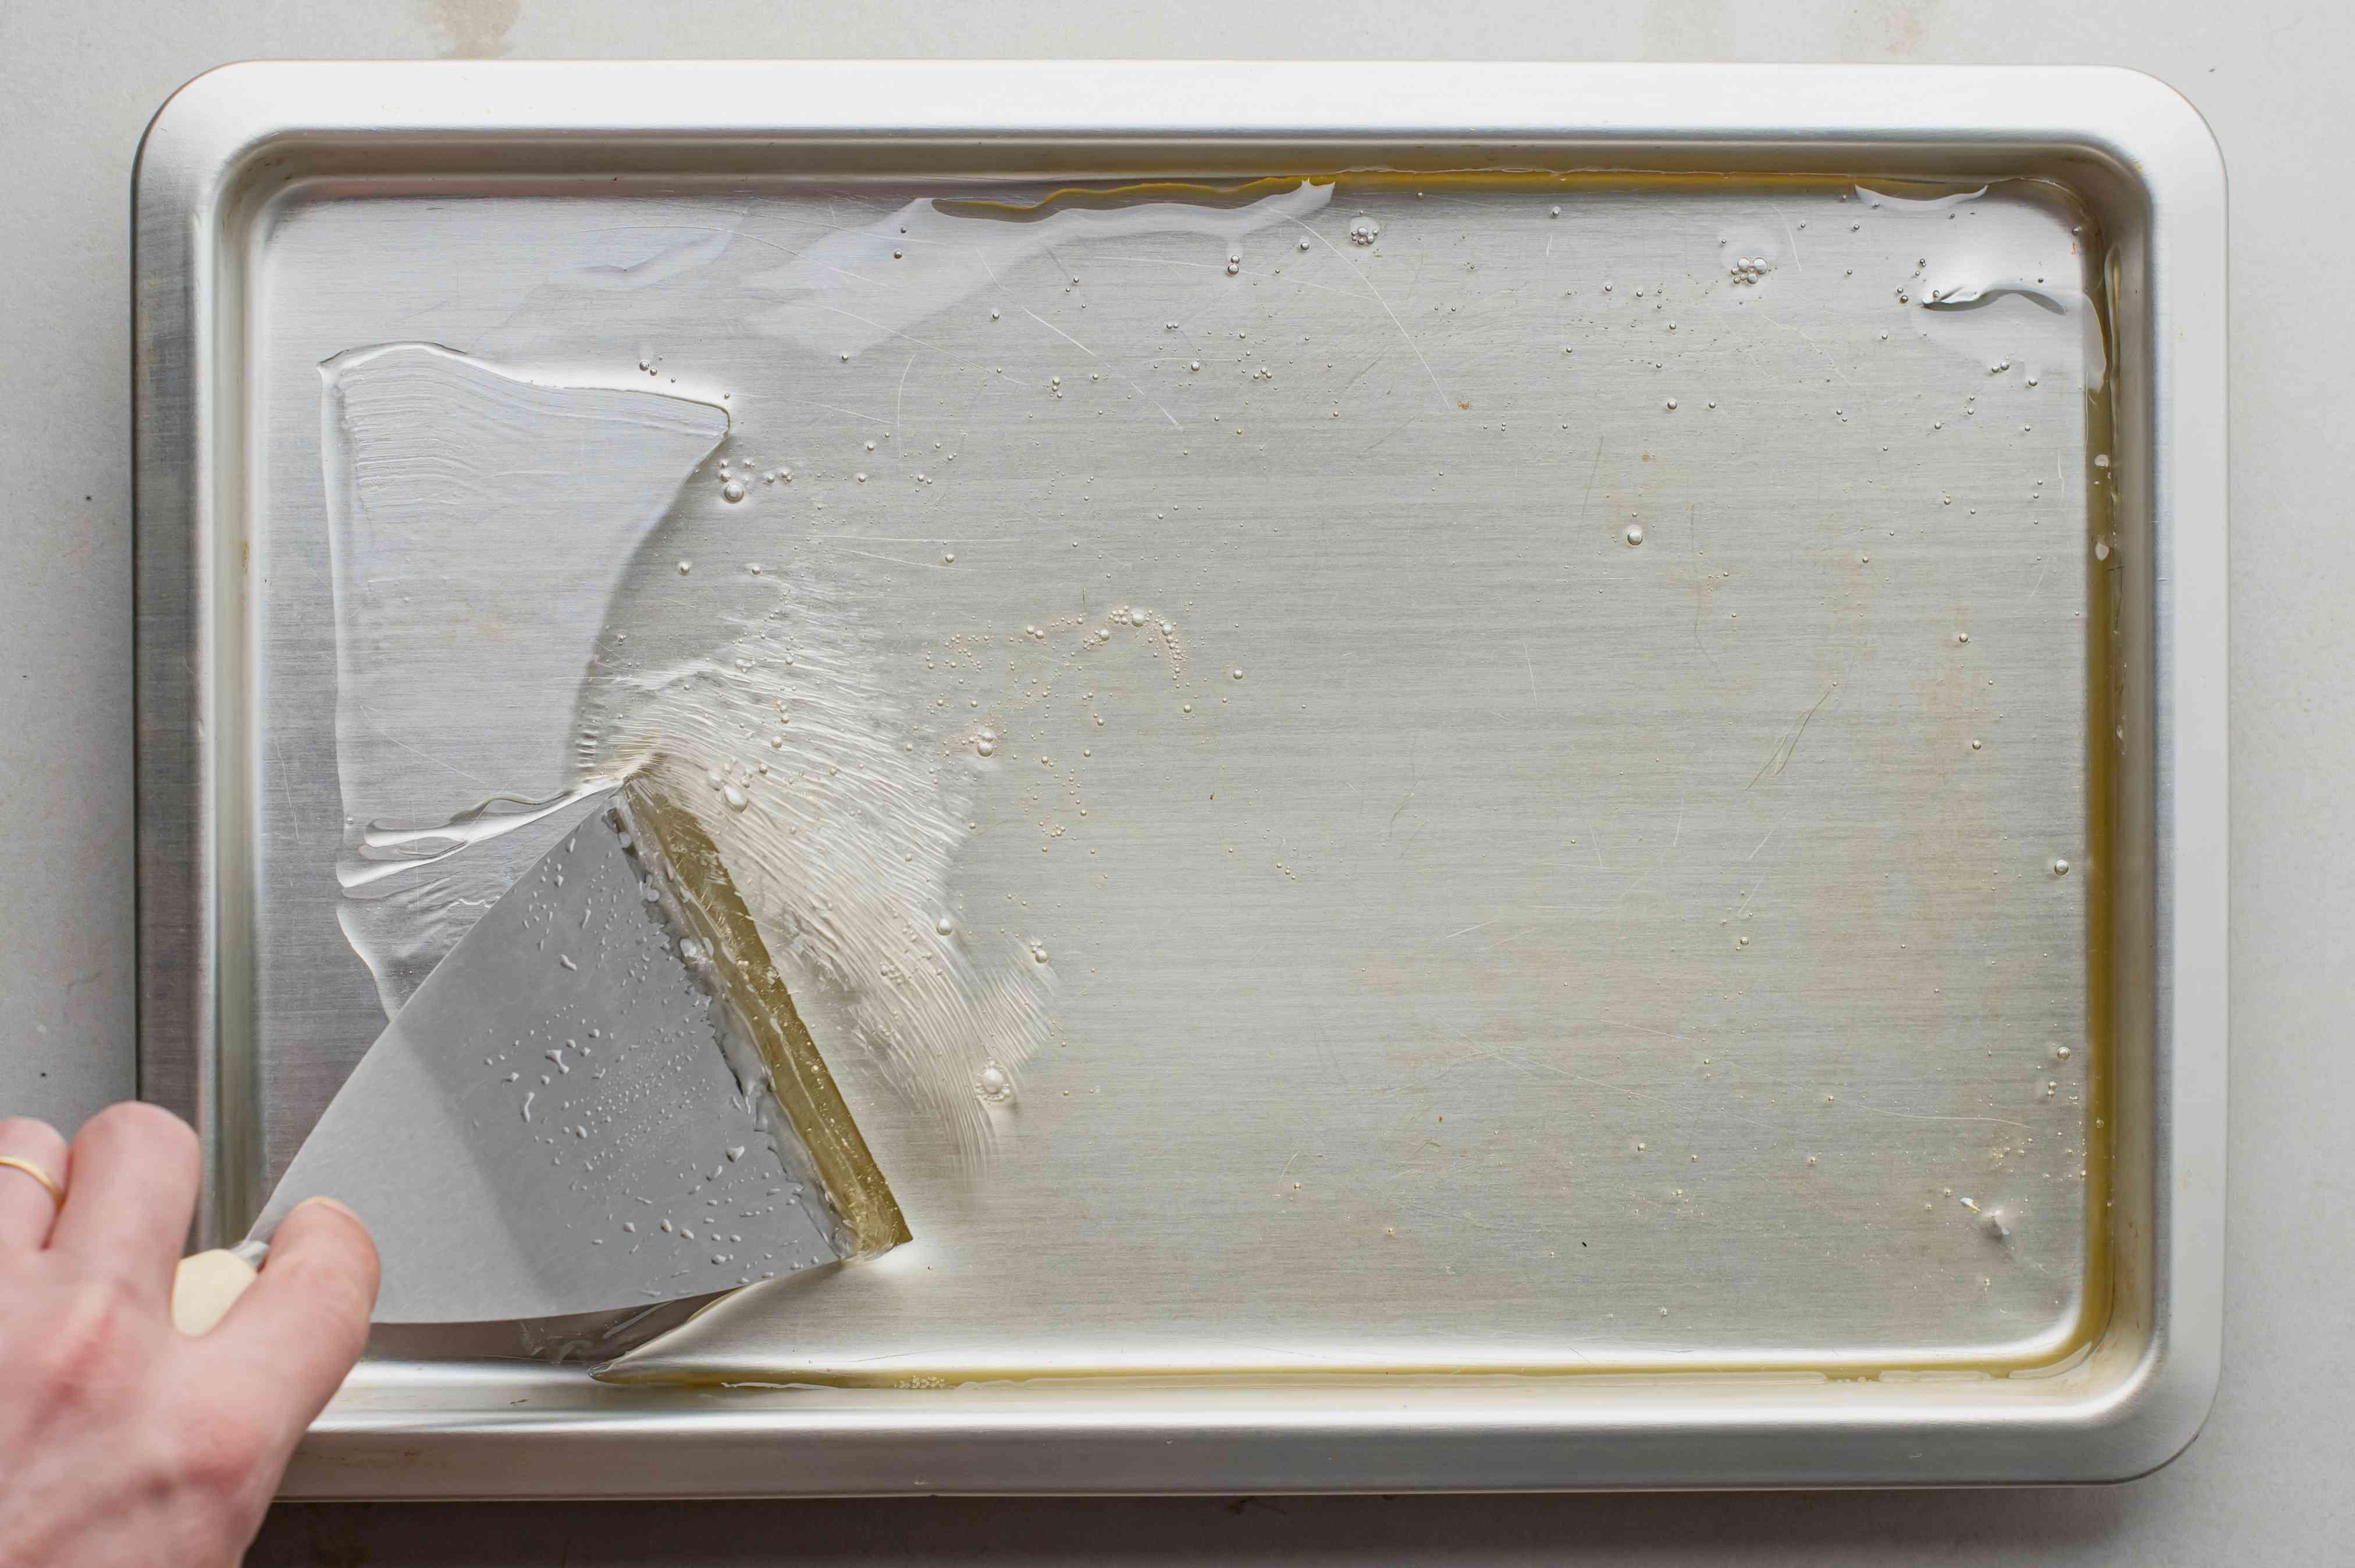 Scraping fondant mixture on a sheet pan